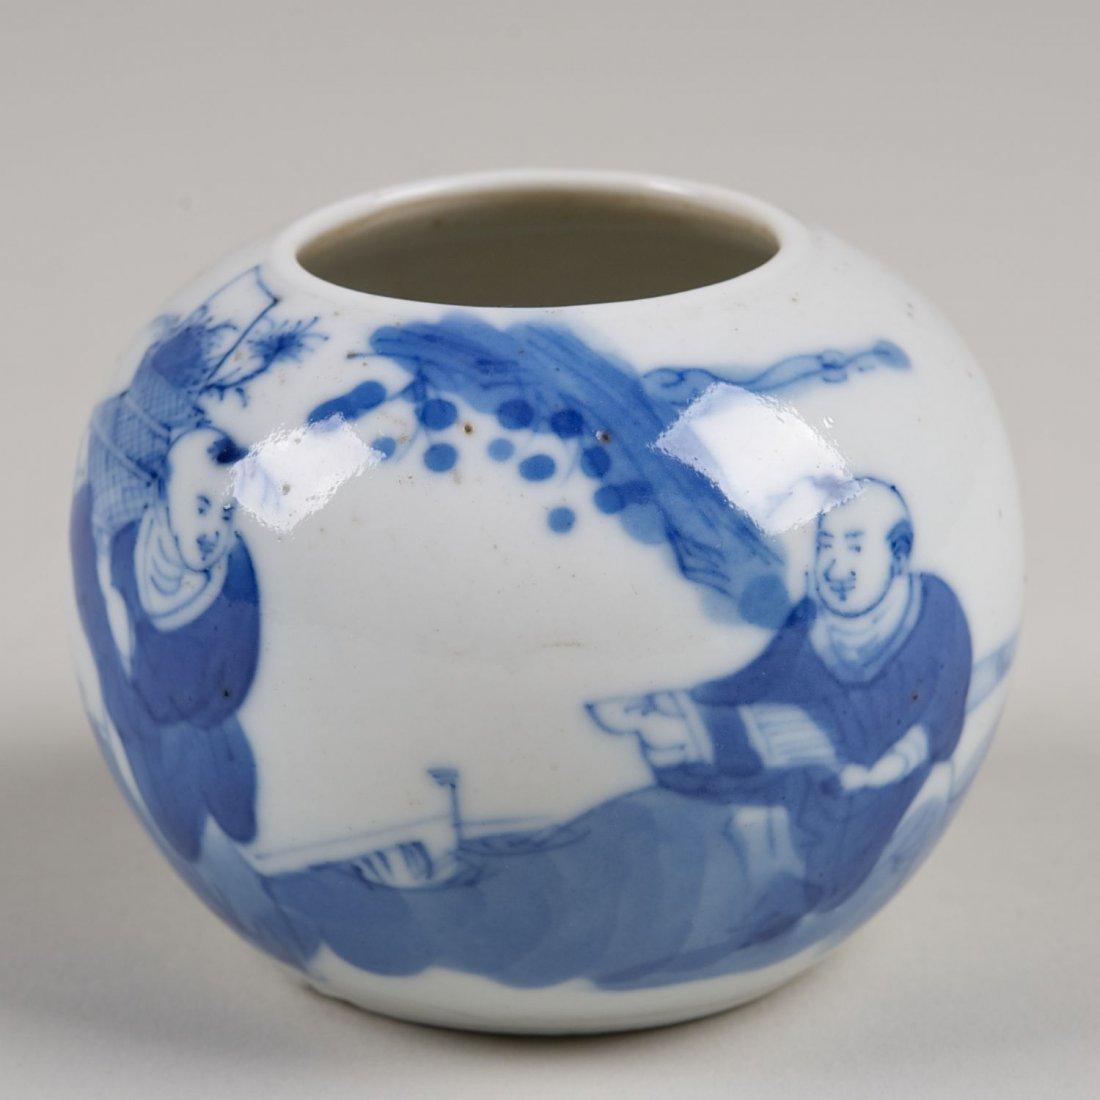 Chinese blue and white porcelain small globular jar